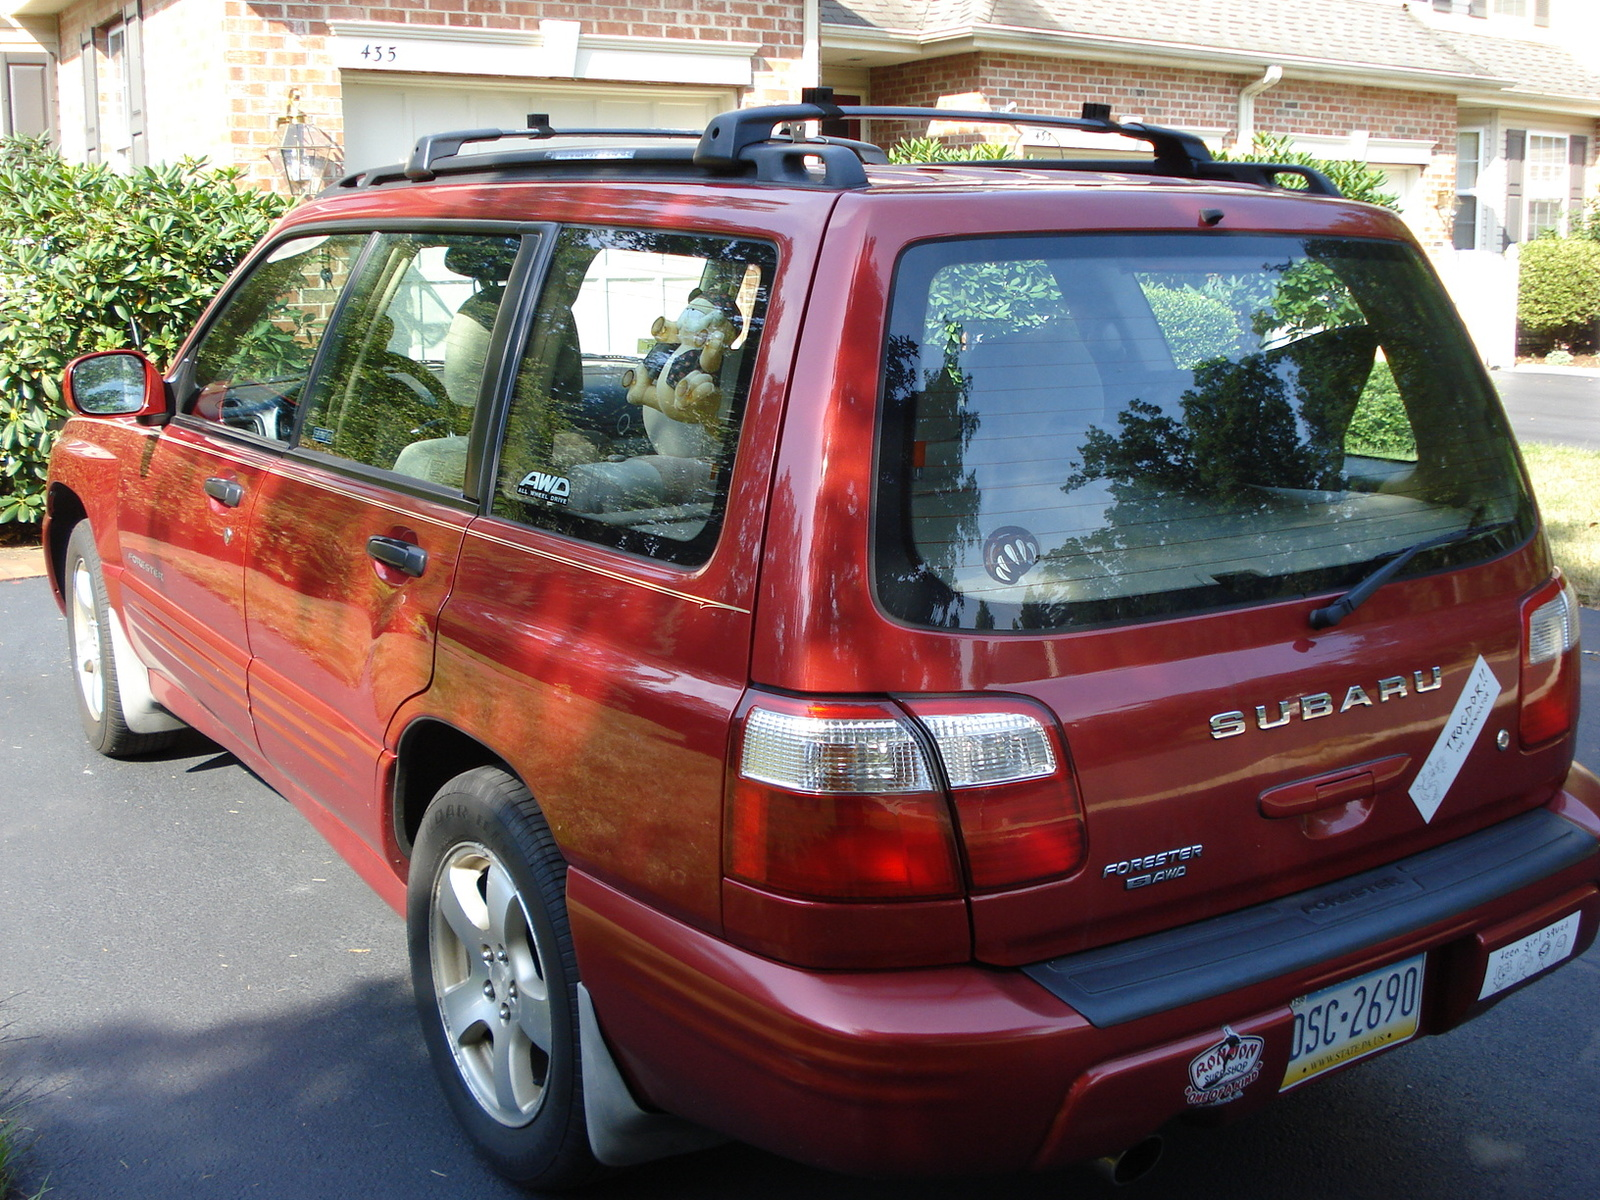 2001 Subaru Forester Image 20